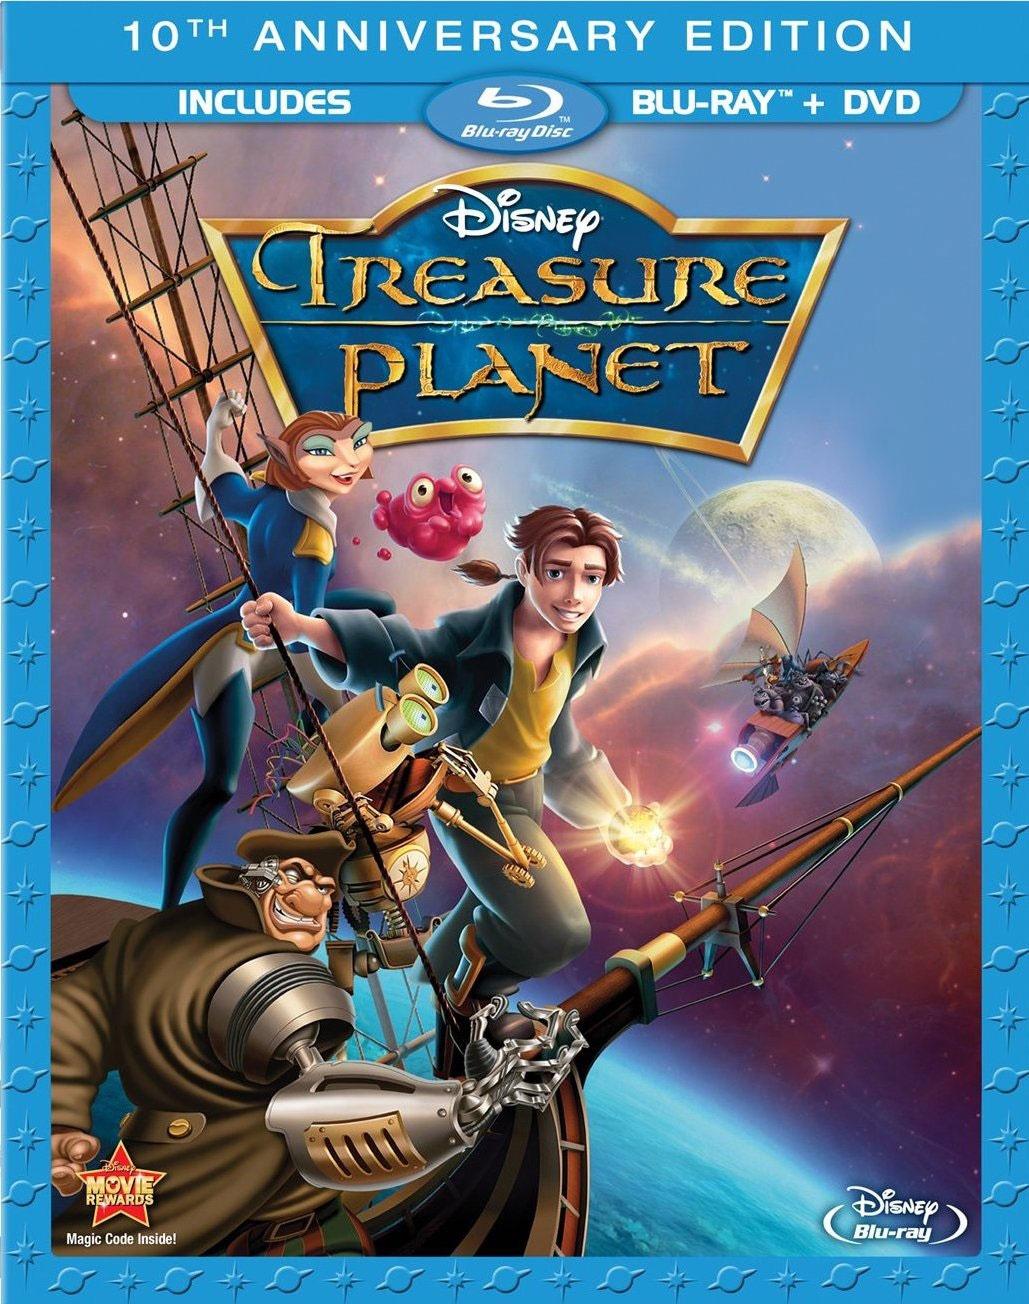 Treasure Planet (10th Anniversary Edition) (Blu-ray Disc)